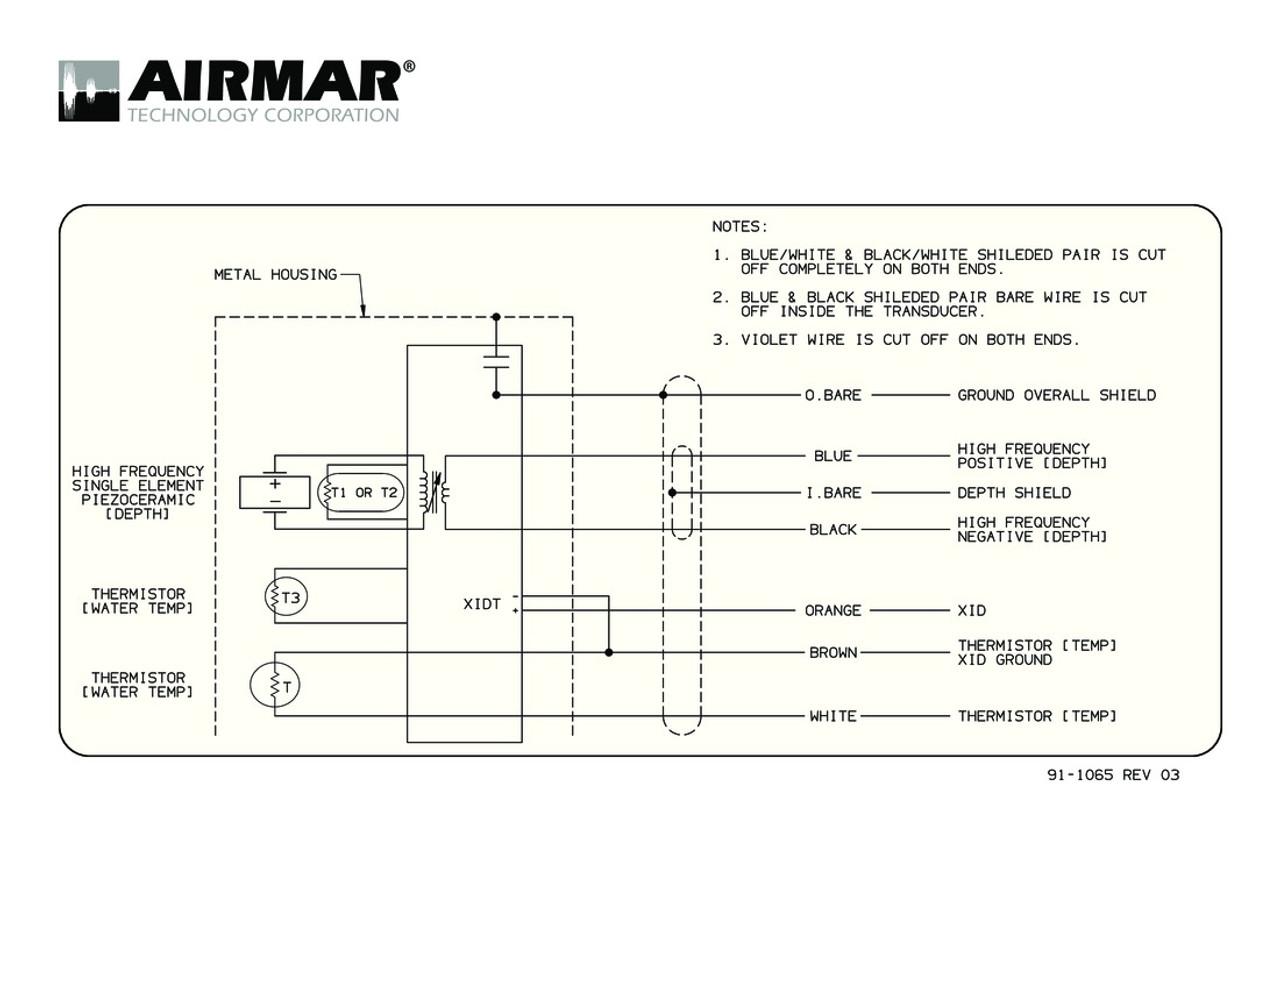 Braemar Air Conditioner Wiring Diagram - Park Avenue Wiring Diagram 2001 -  zebdig.yangfamilytaichi.itWiring Diagram Resource